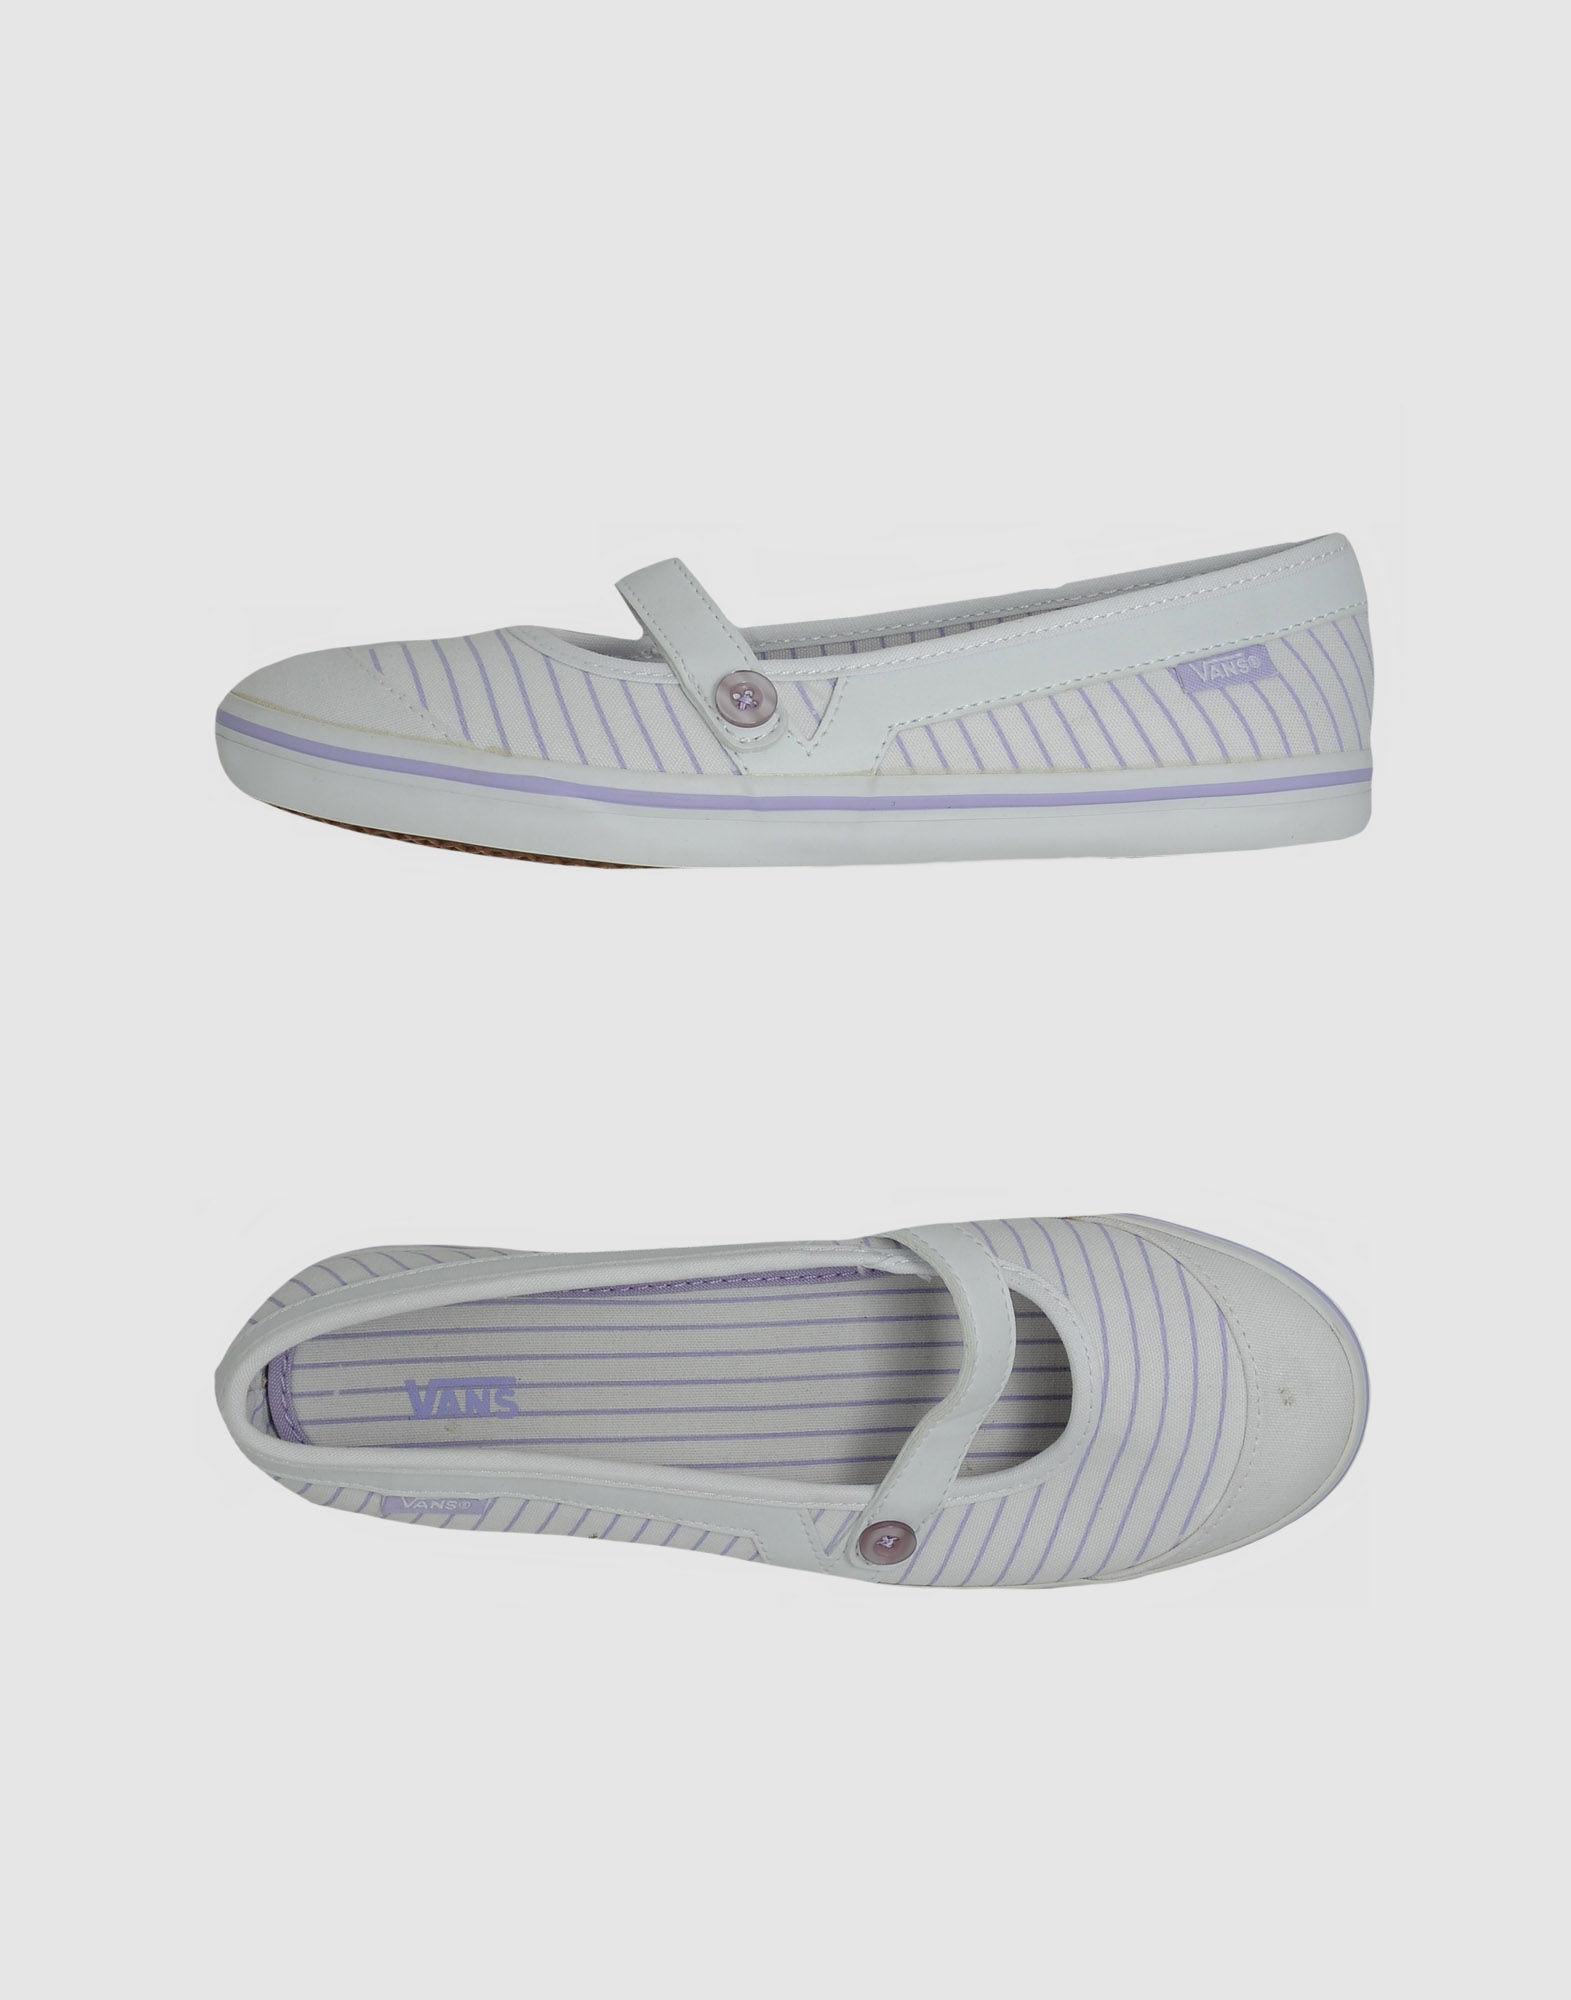 Vans Ballet Flats in White - Lyst